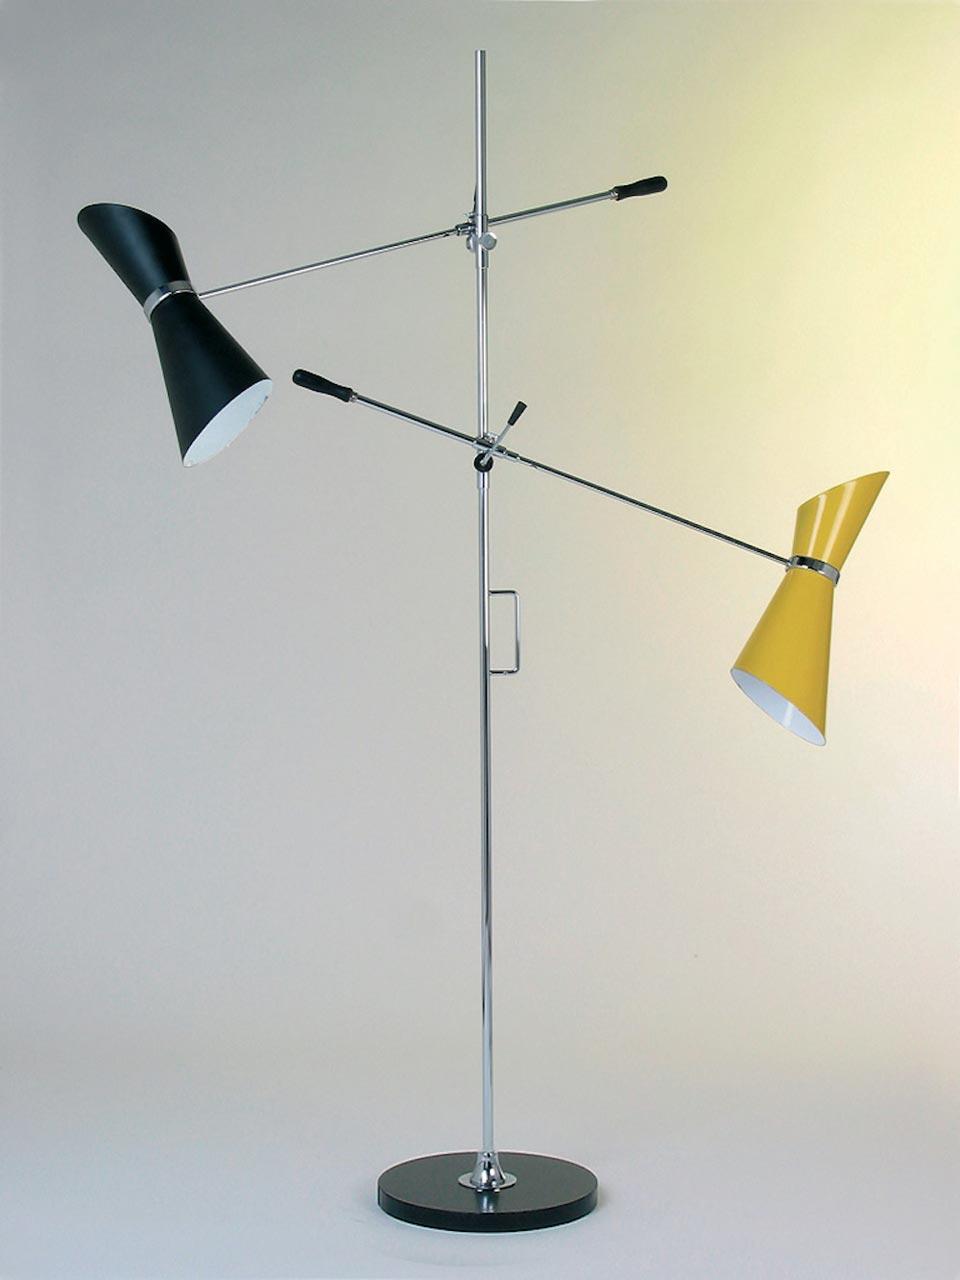 Floor Lamp And Adjule Arms